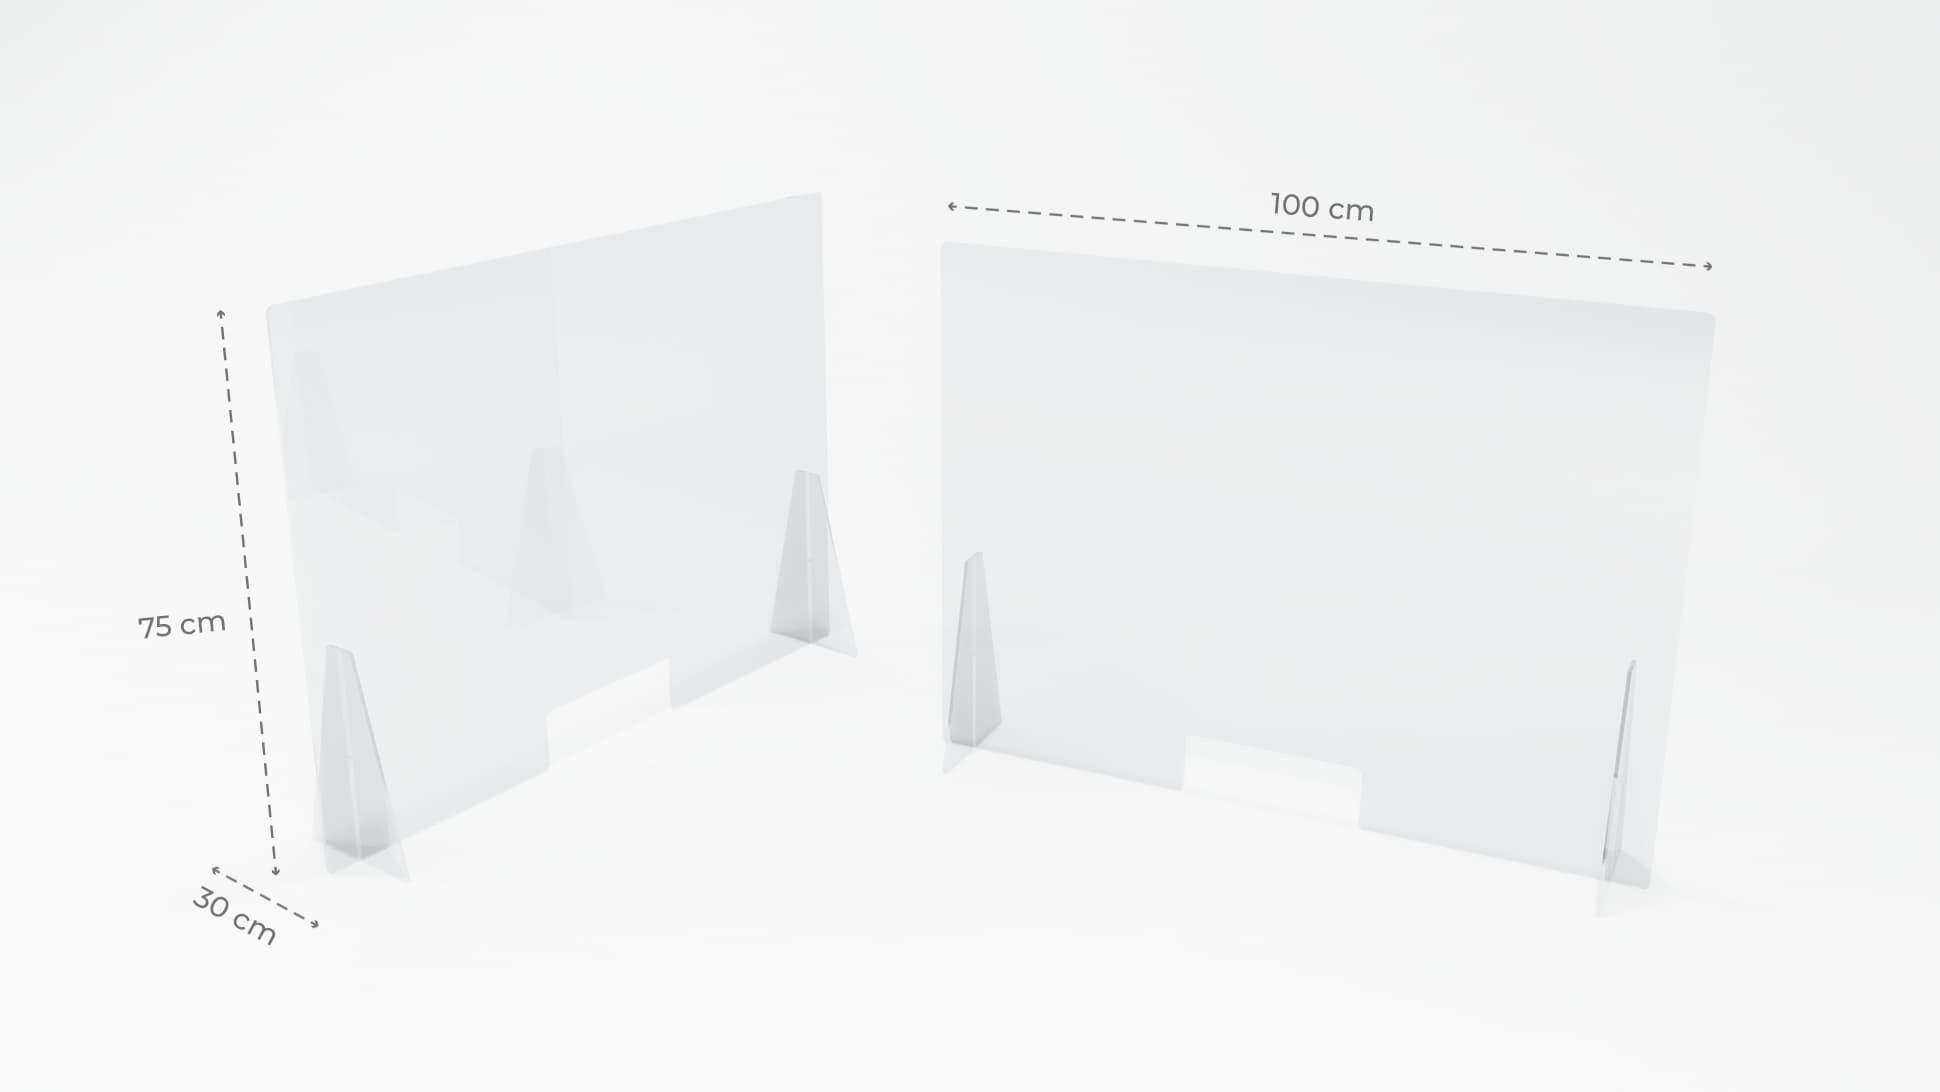 Separè parafiato in plastiglass trasparente 5 mm grande | tictac.it